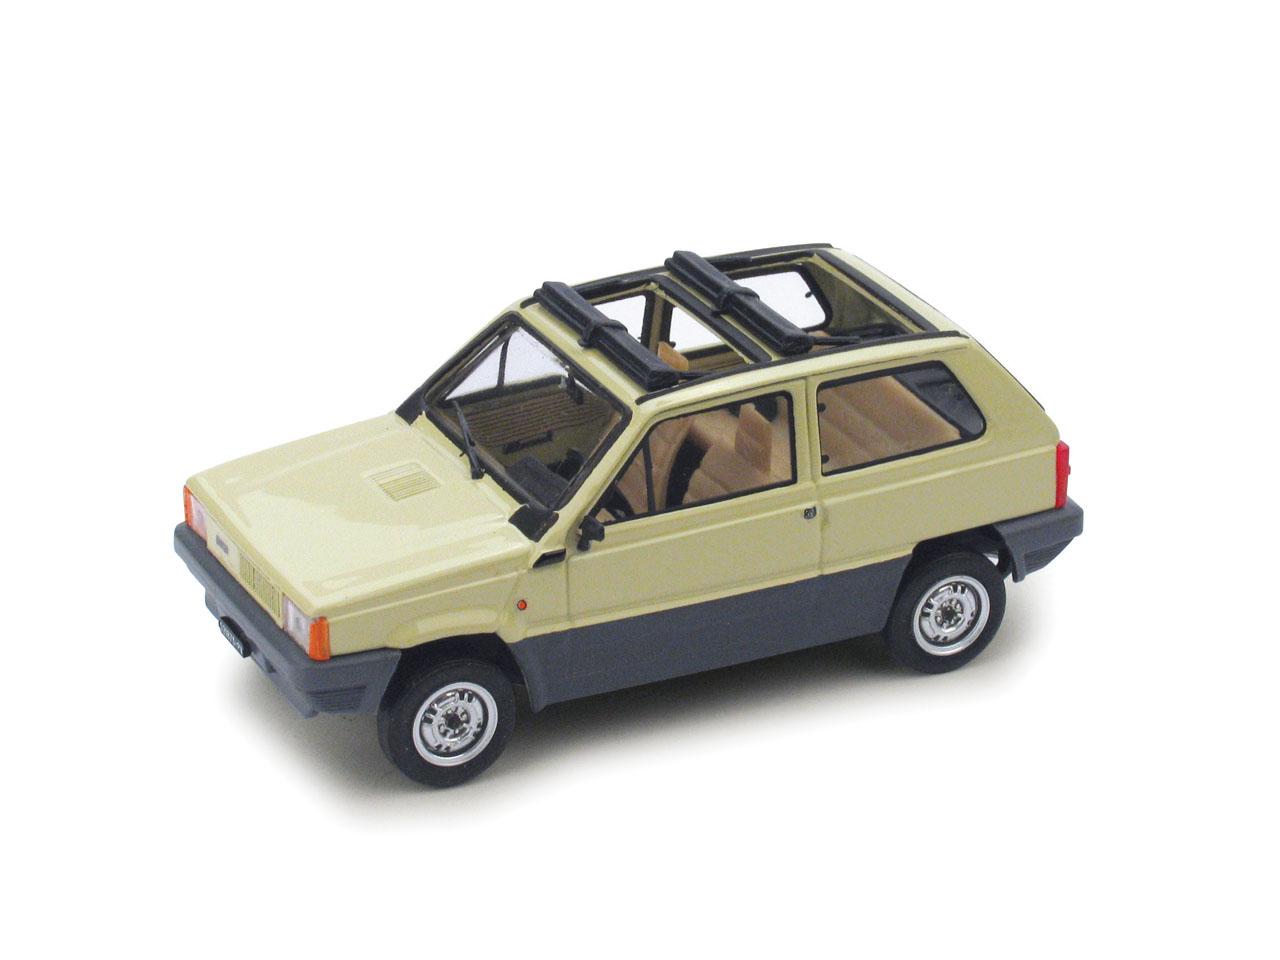 Fiat Panda 45 Techo de lona abierto (1981) Brumm 1/43 Blanco senegal